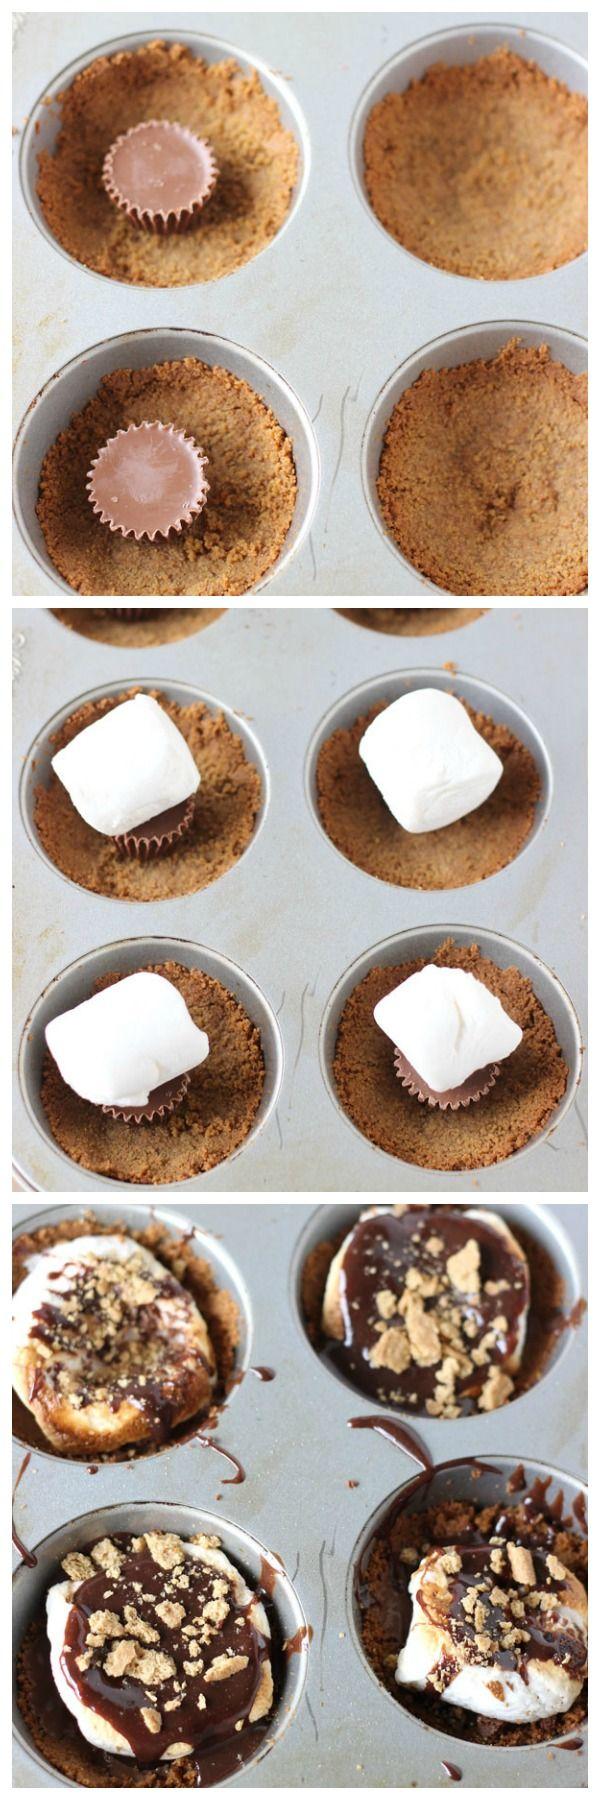 Peanut Butter S'mores Cups - via Blahnik Baker